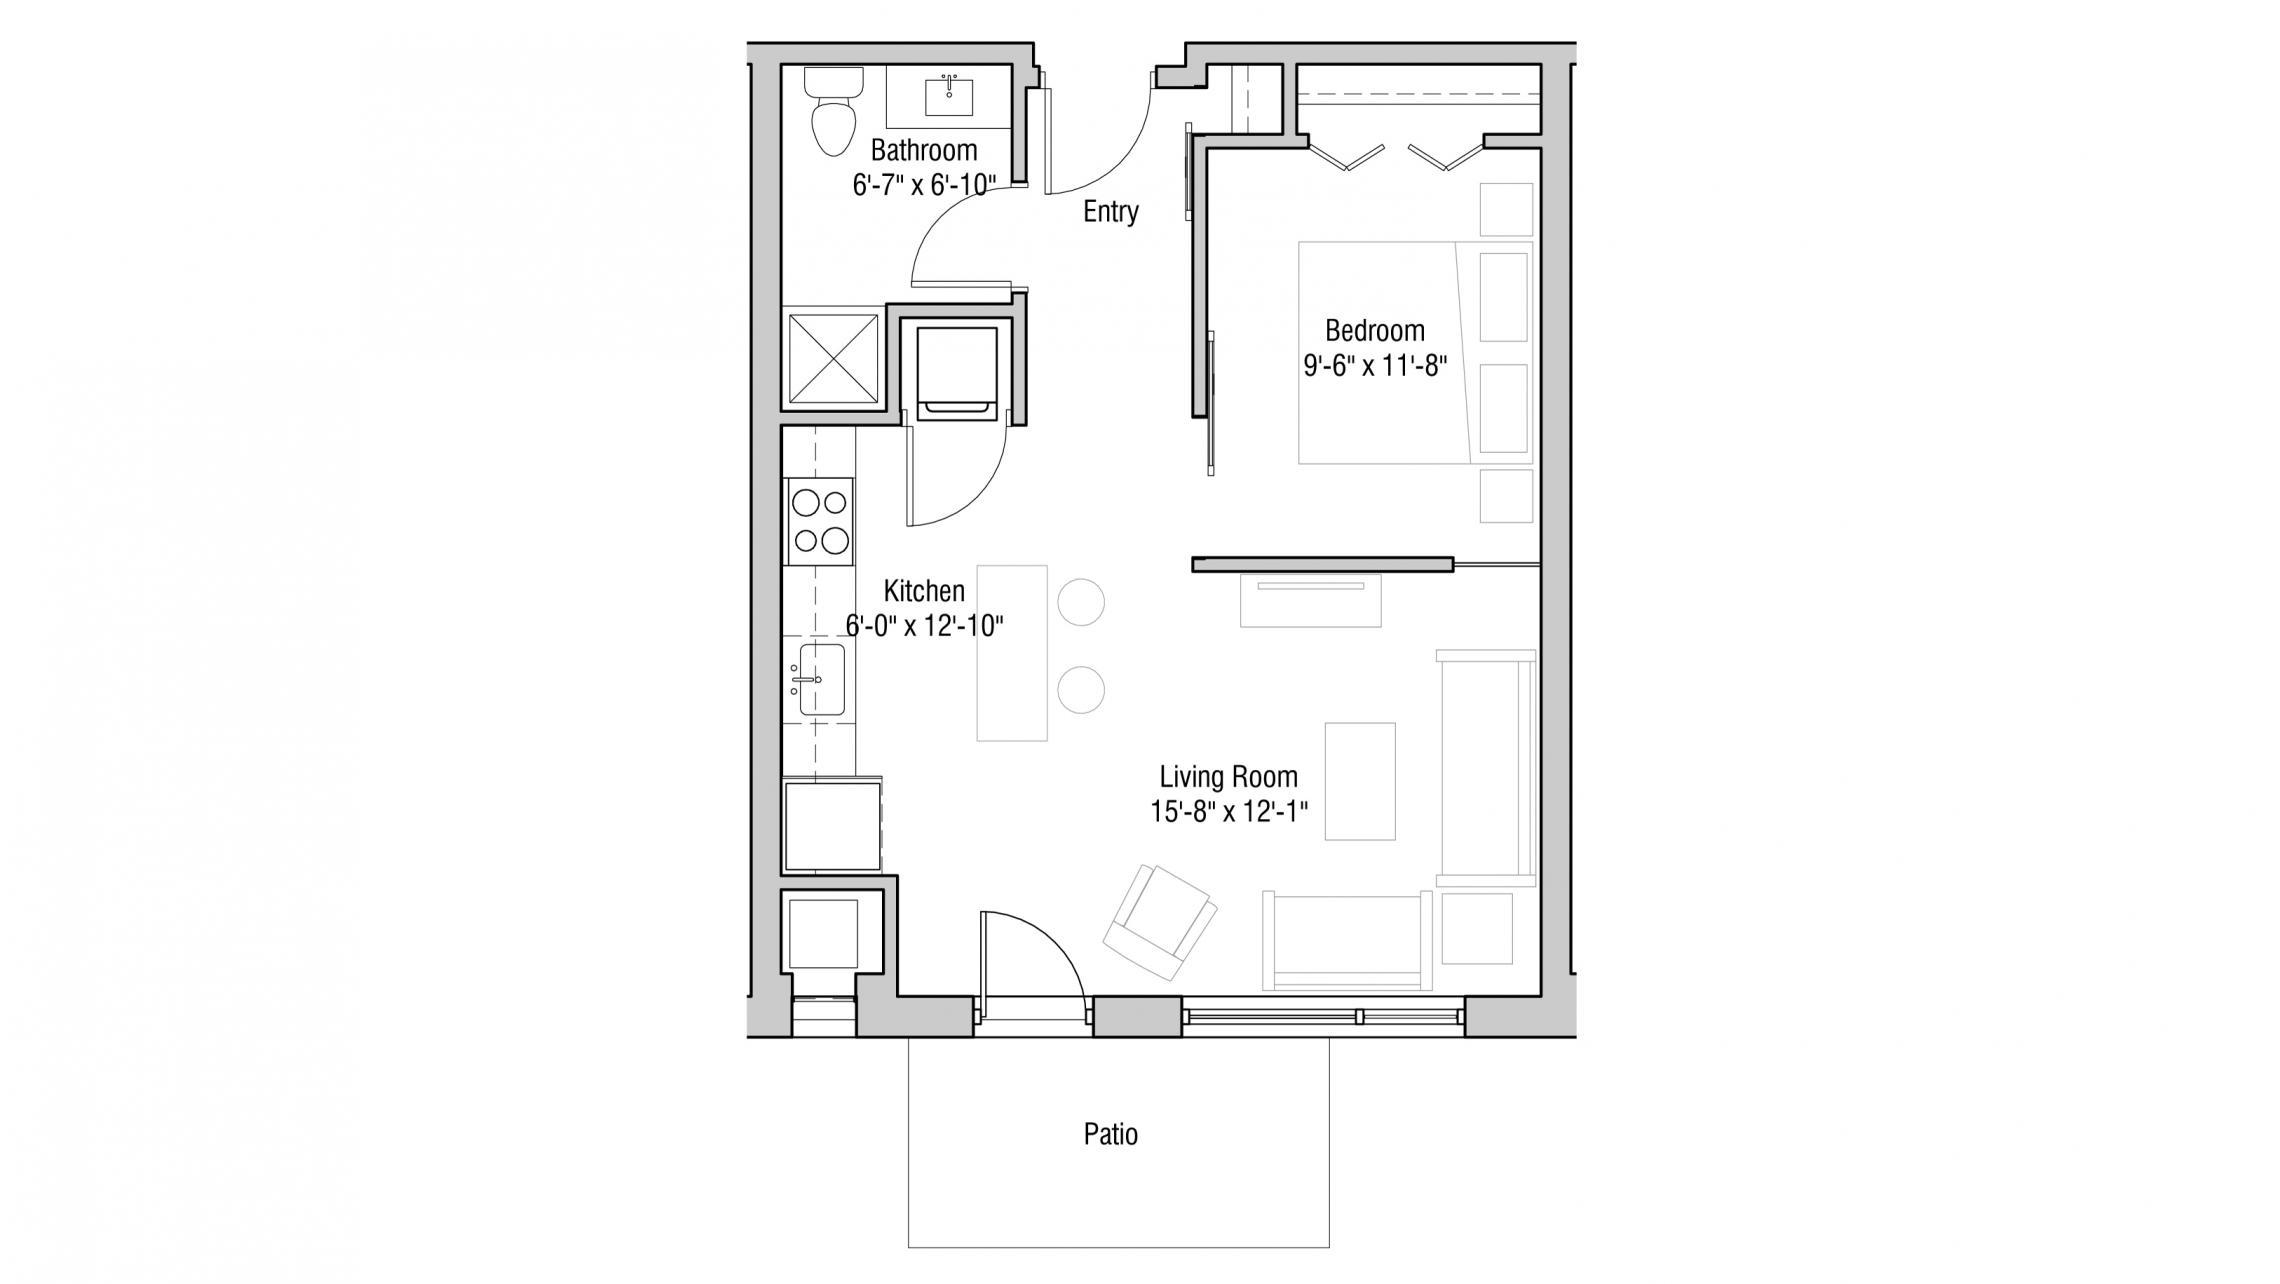 ULI Quarter Row 122 - One Bedroom, One Bathroom